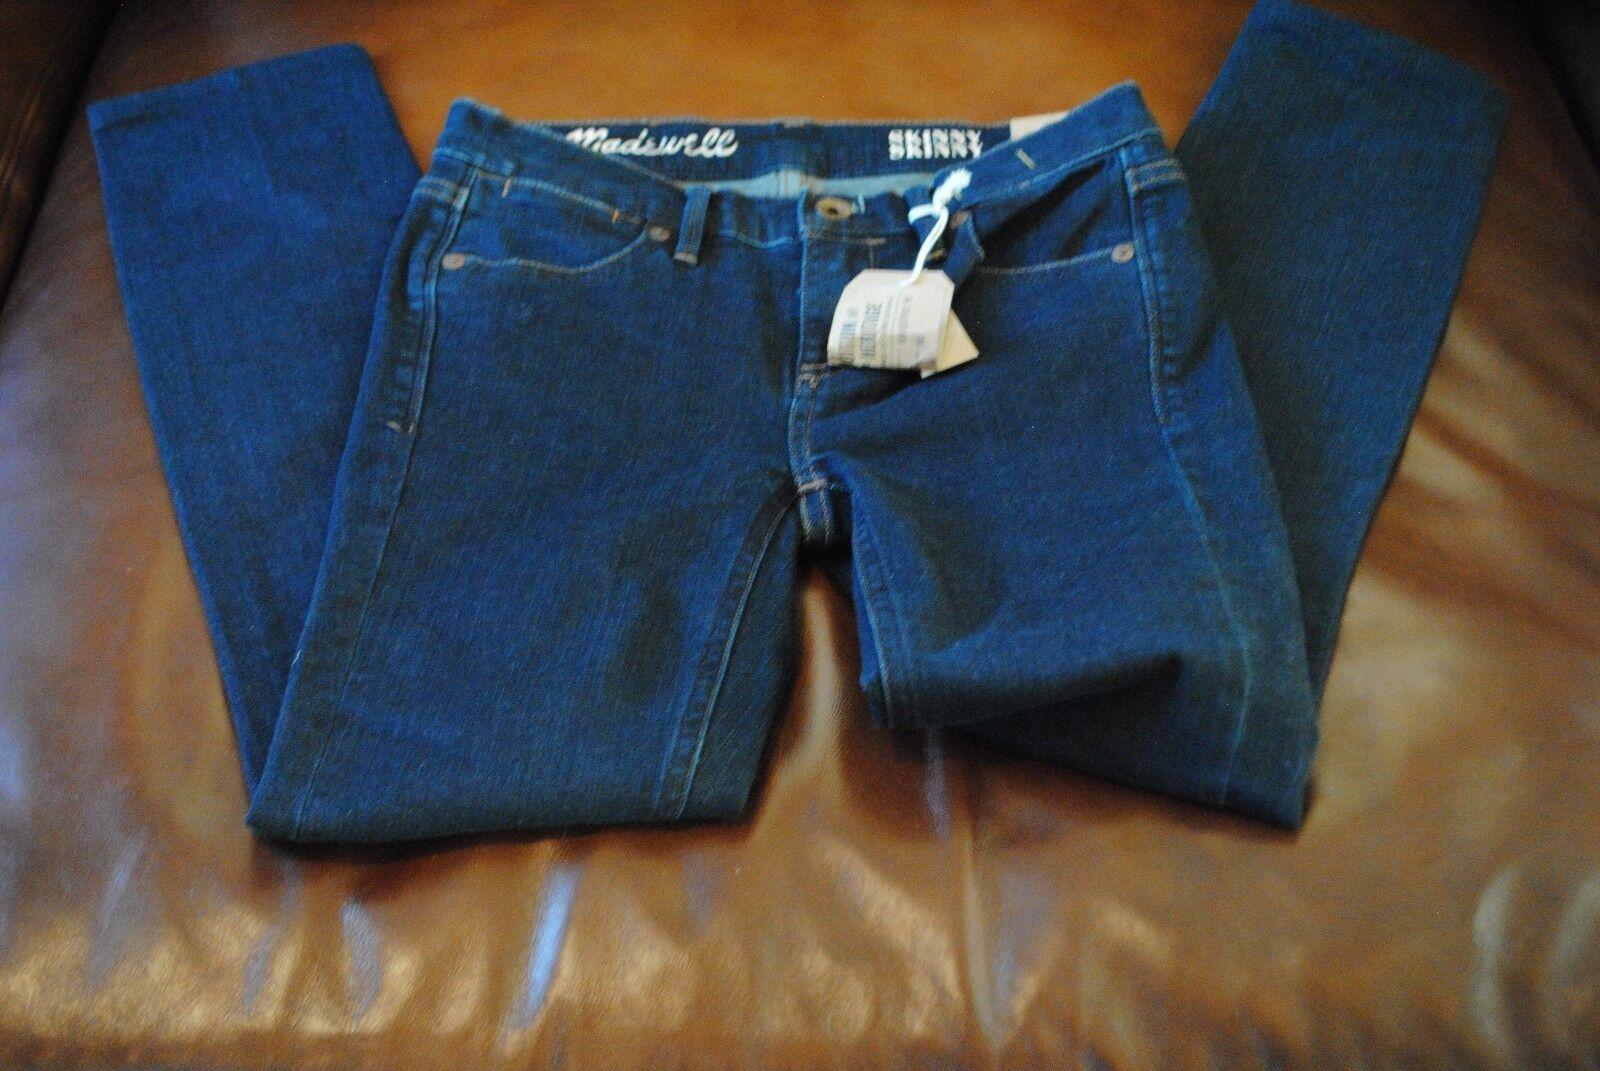 NWT Skinny Skinny Jeans in Madewell Rinse Retail  115 Sz 24